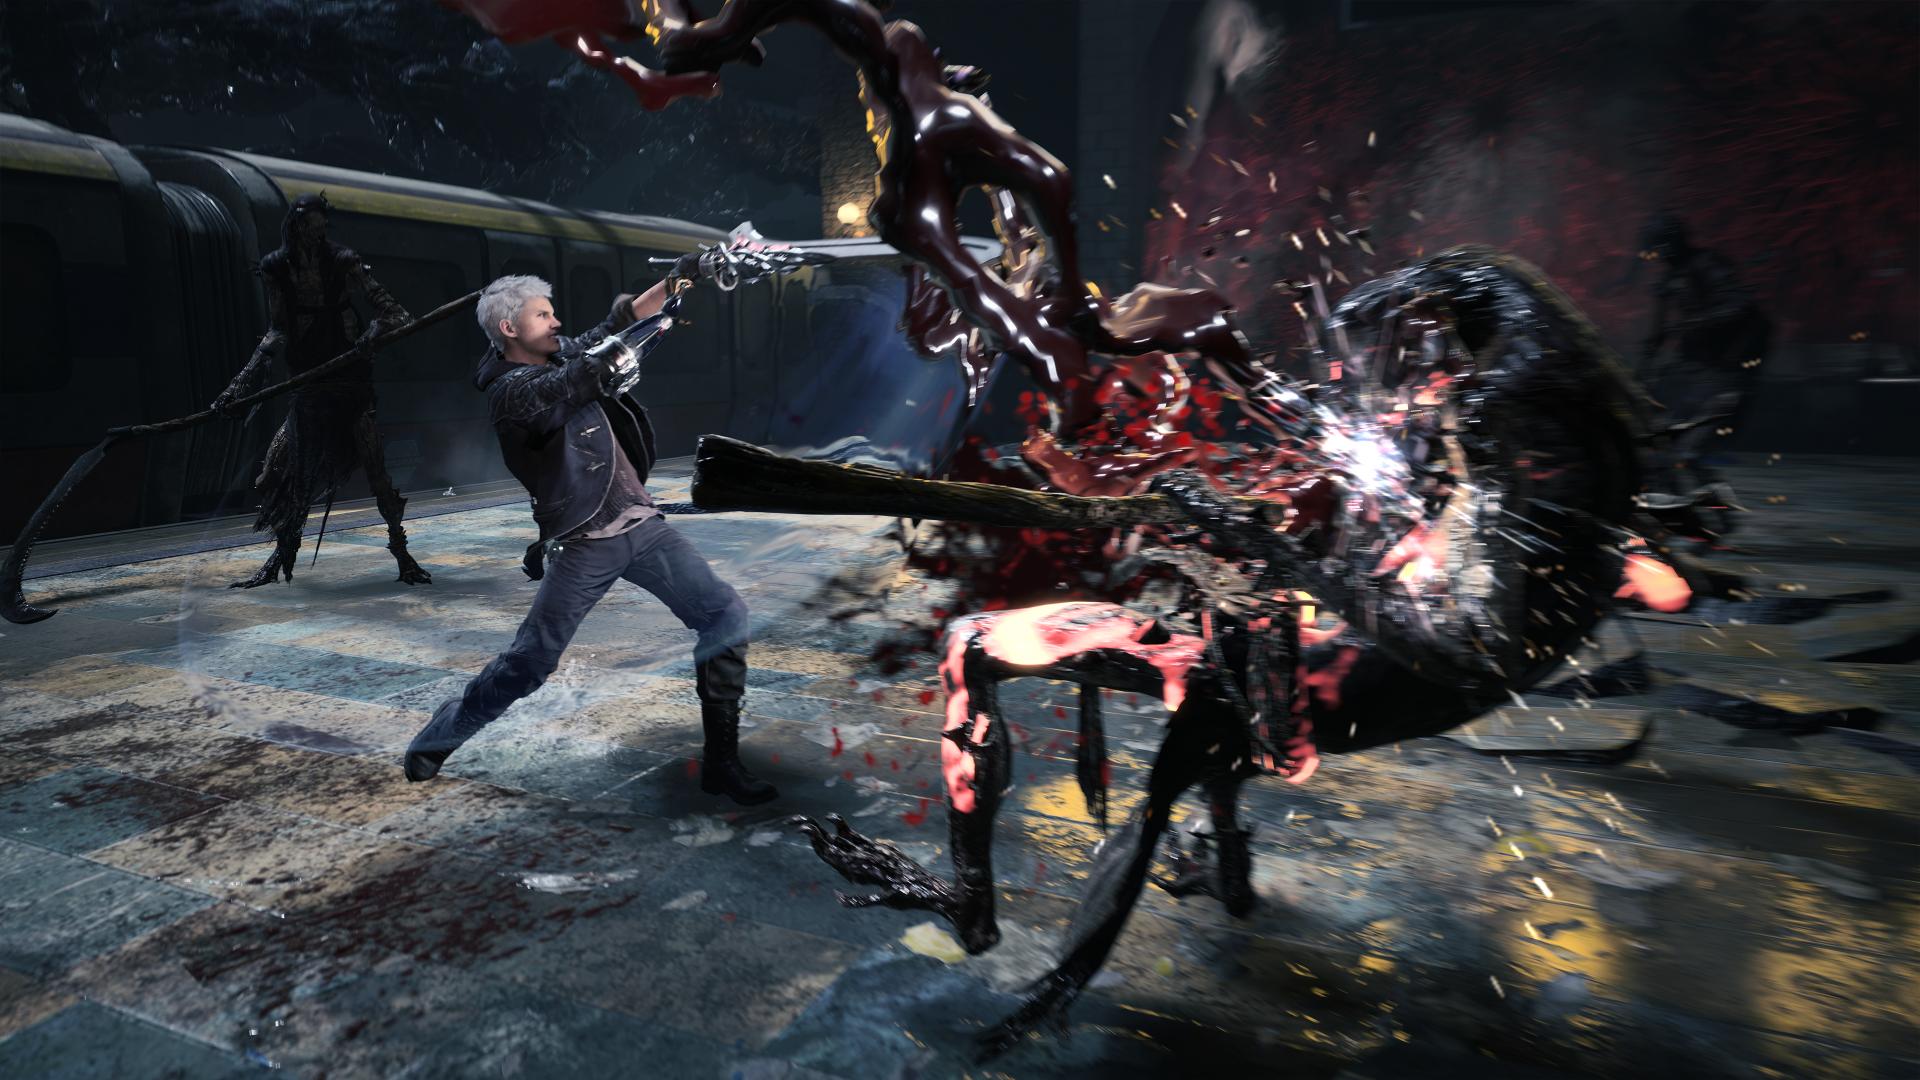 Wallpaper Devil May Cry 5 E3 2018 Screenshot 4k Games